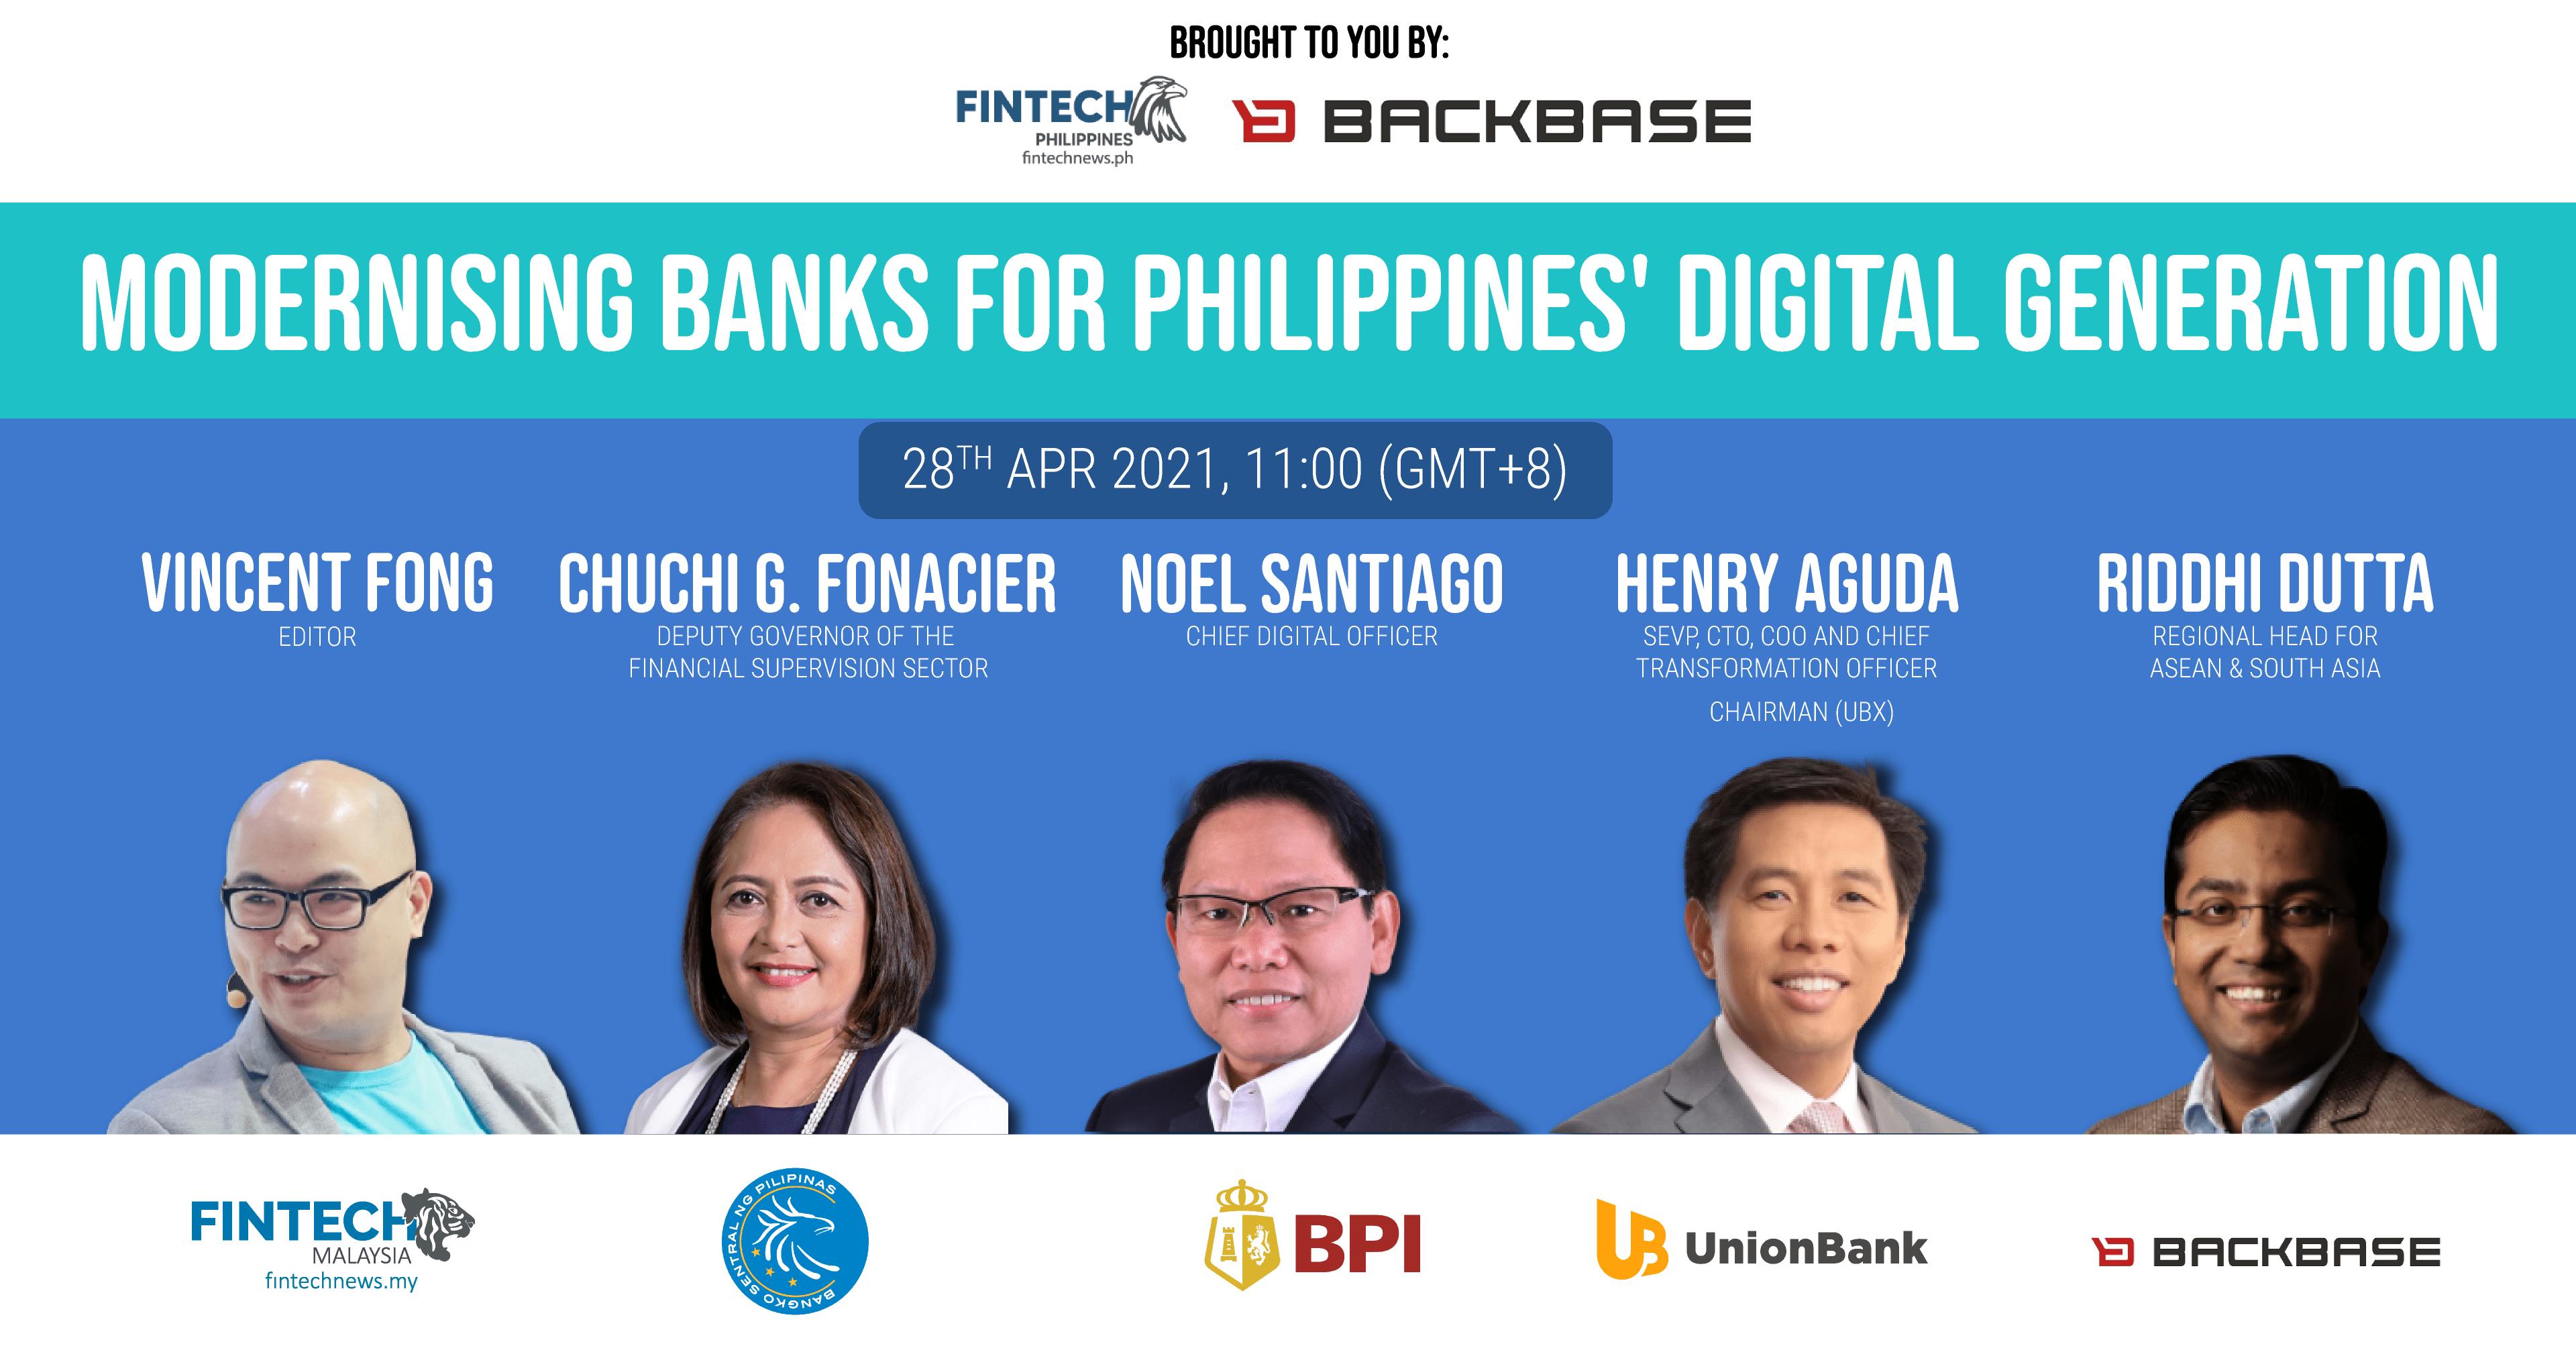 Modernising Banks for Philippines' Digital Generation